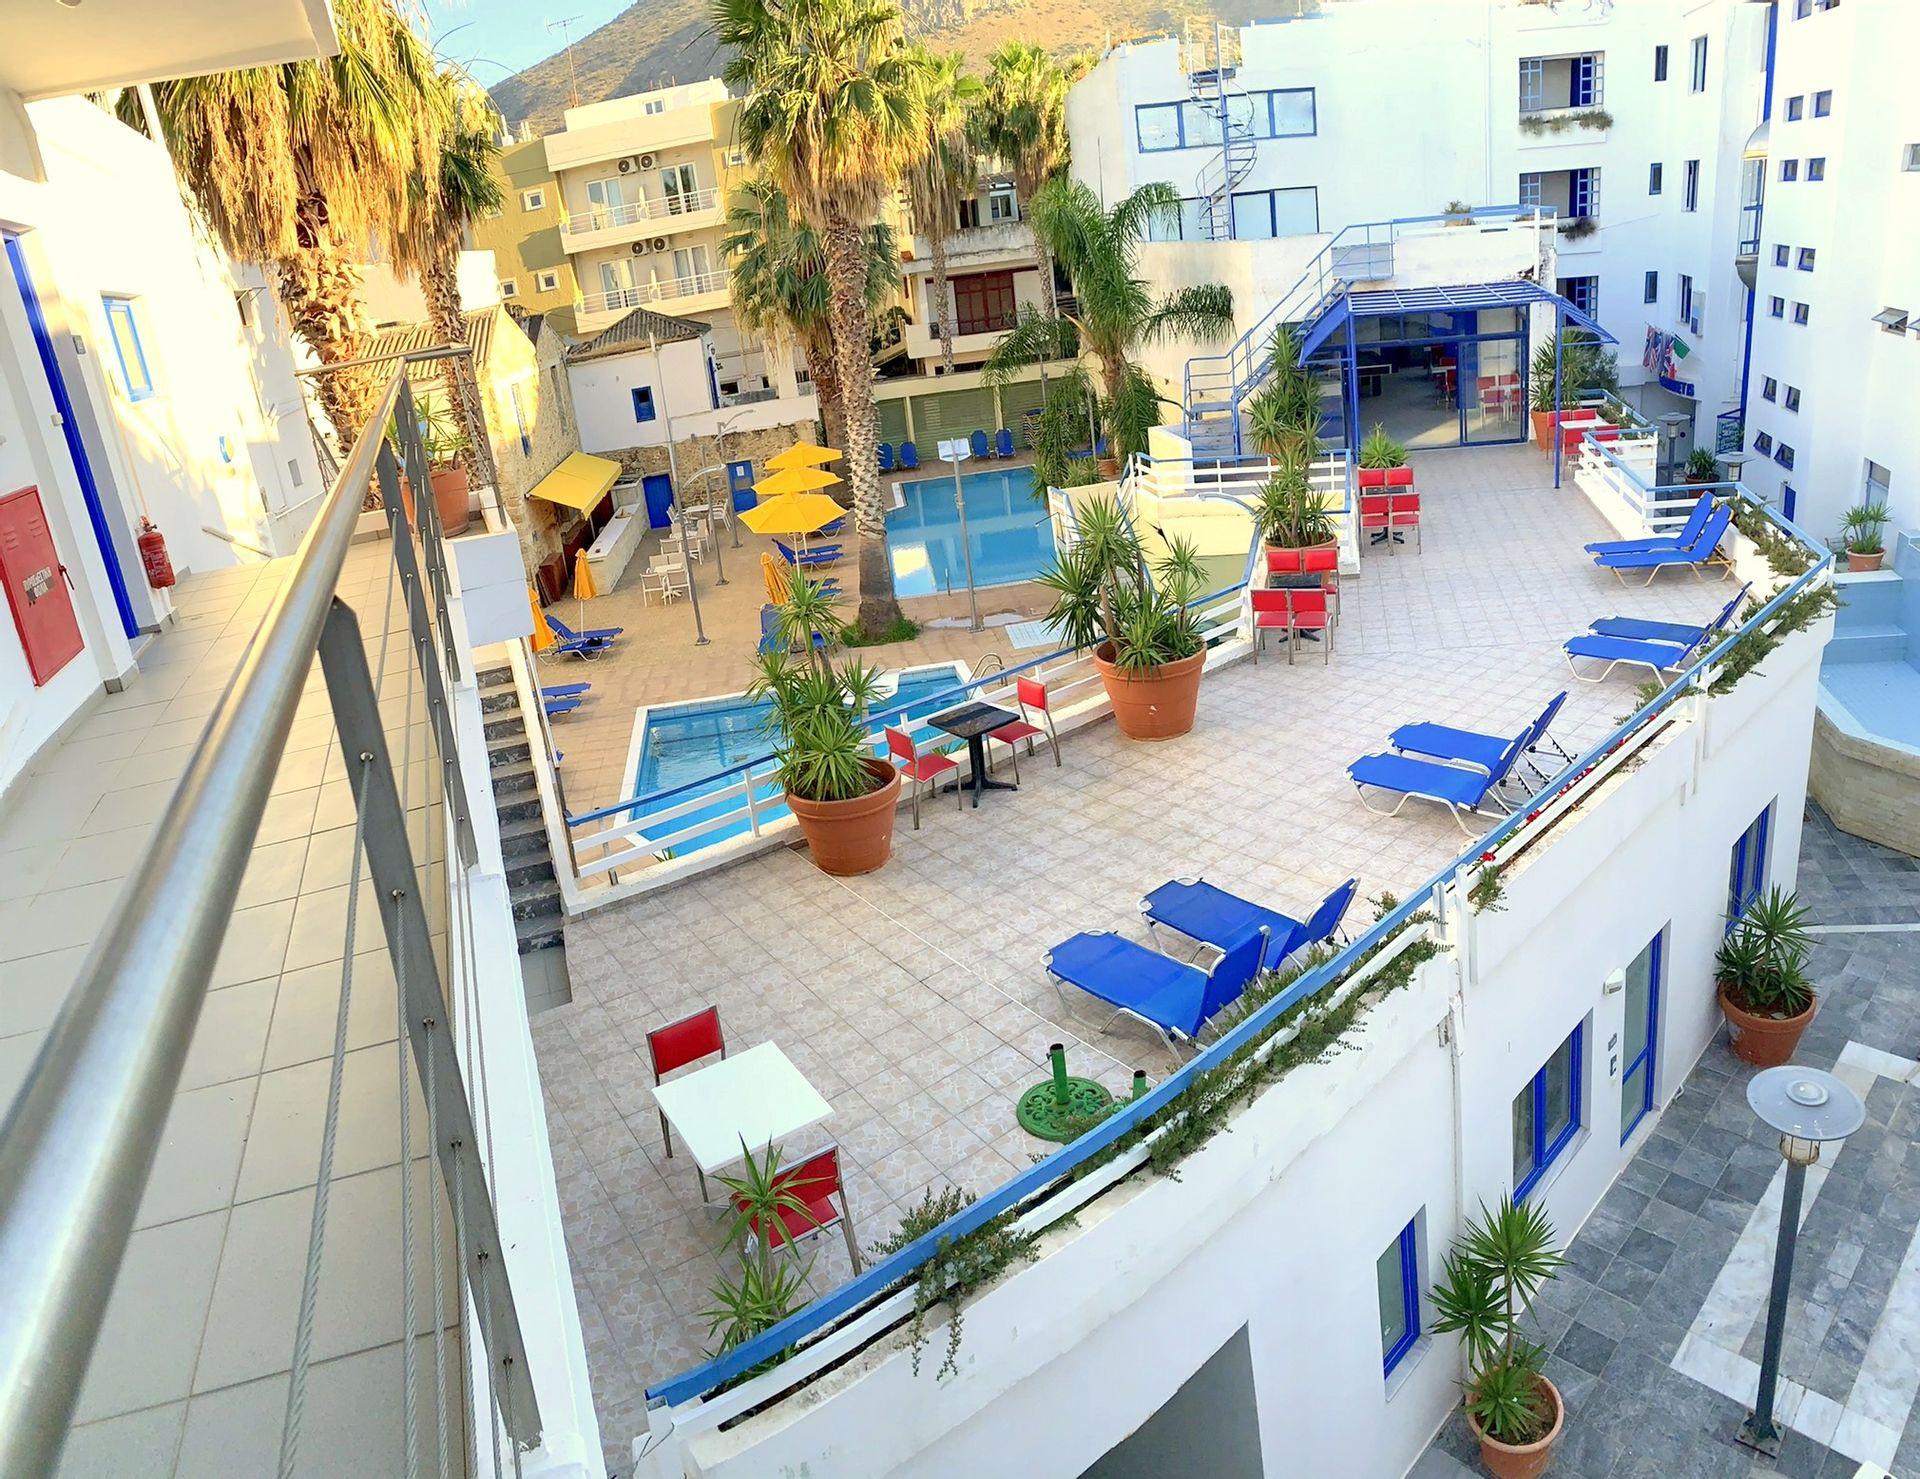 Kassavetis Center - Hotel Studios amp; Apartments